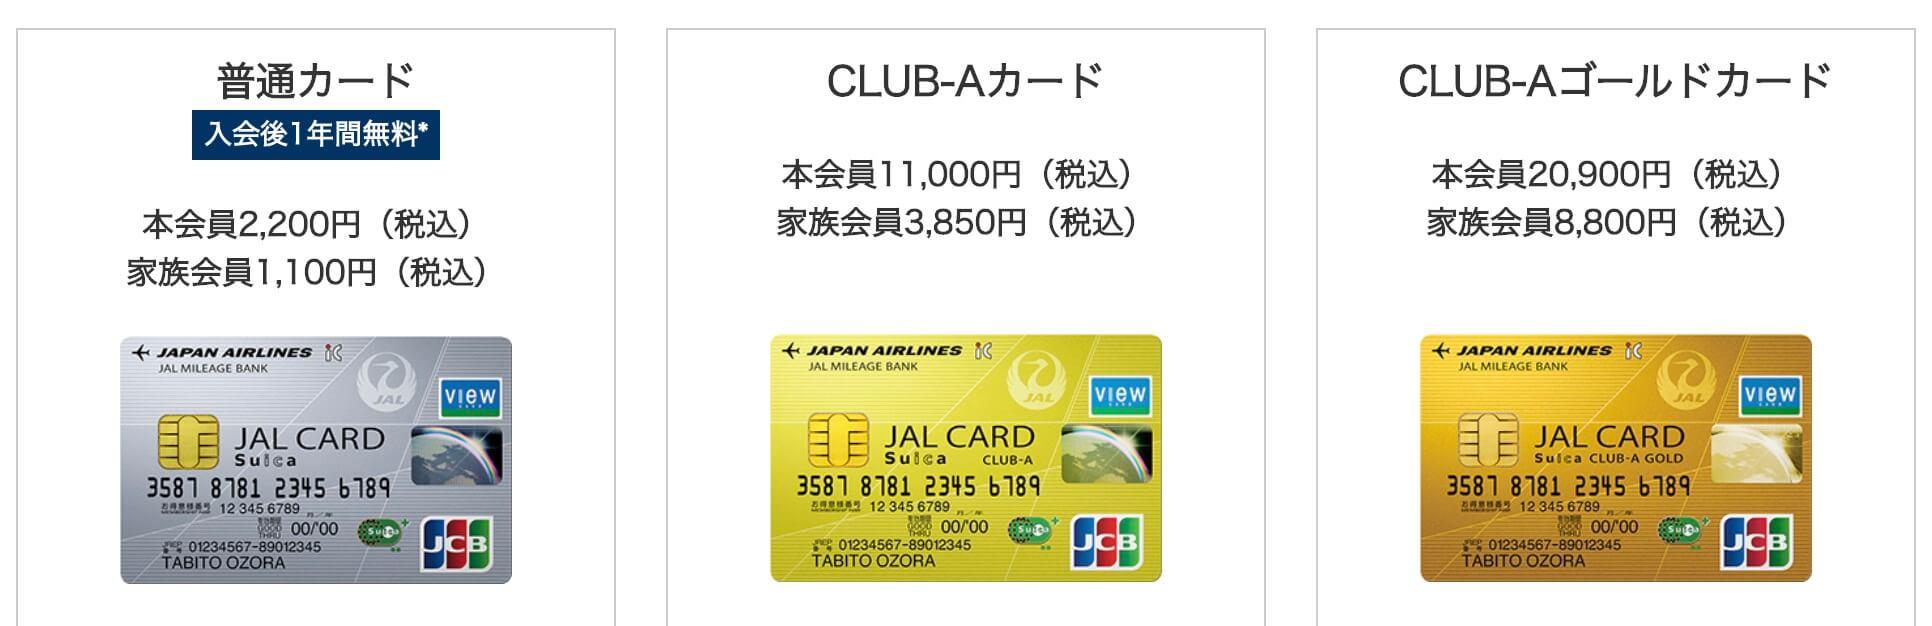 JALカードSuicaの年会費別種類